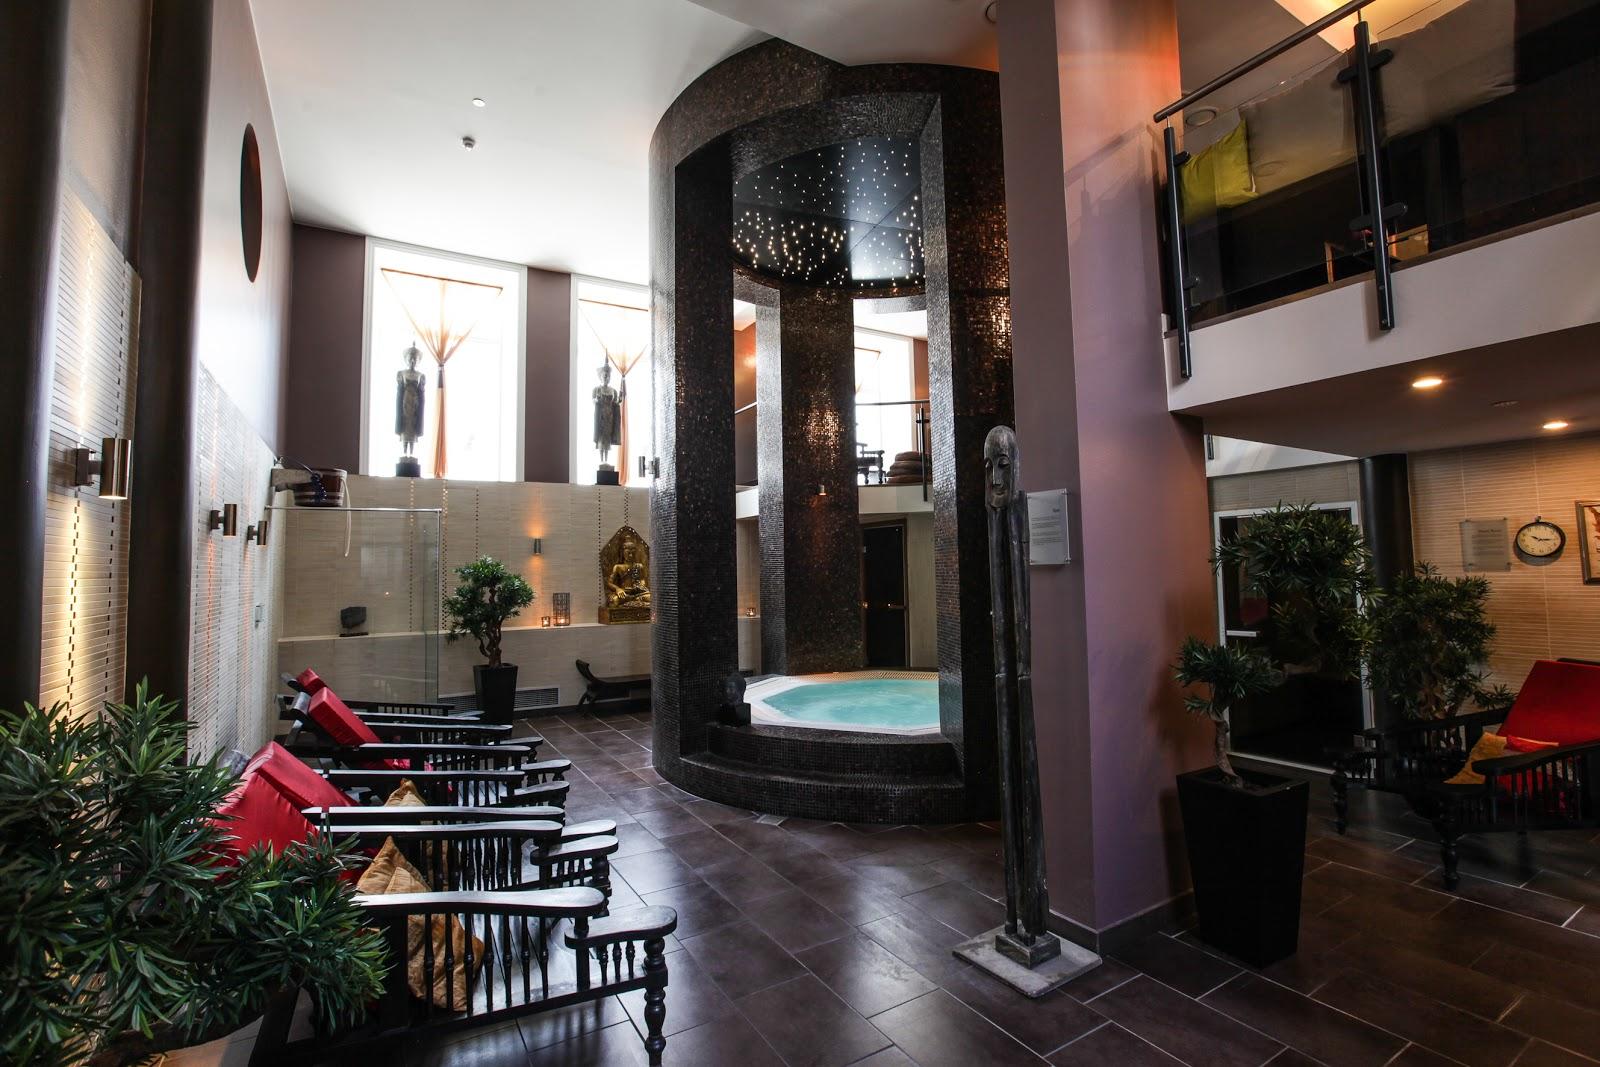 Nimat Spa, Hotel Kong Arthur, Copenhagen | All around the world, baby